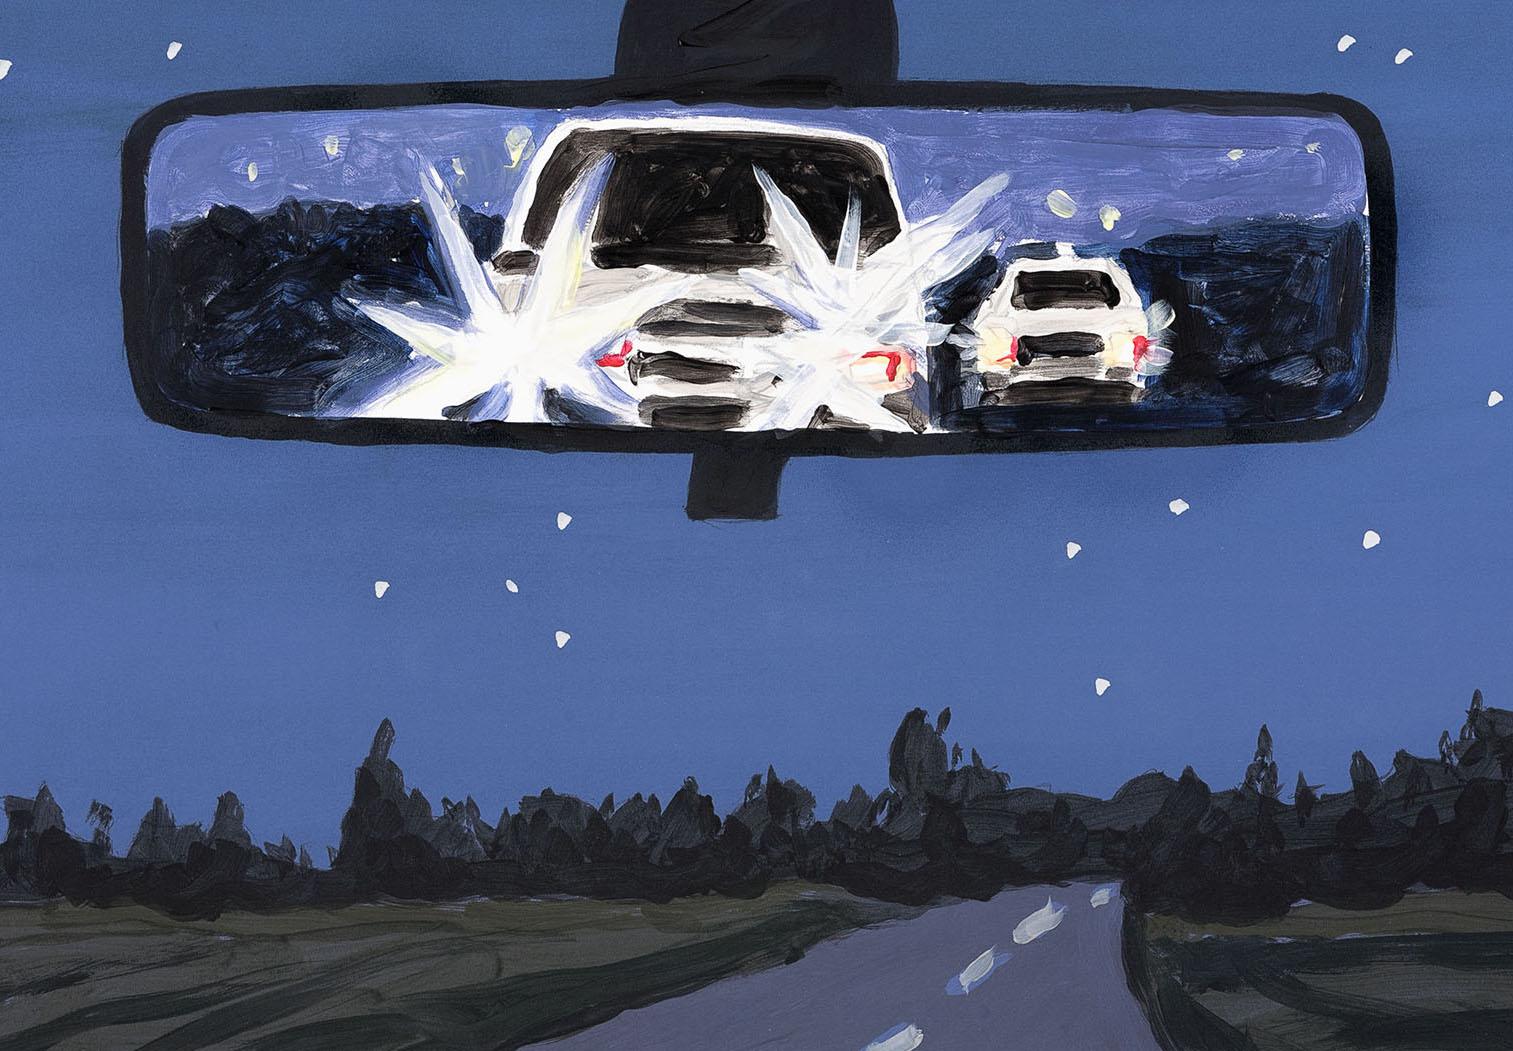 "Richard Bosman,  Rear View Night B    (detail), 2017, monoprint/uniquely hand painted, 21.75"" x 29.75"", $3000.(rare)"